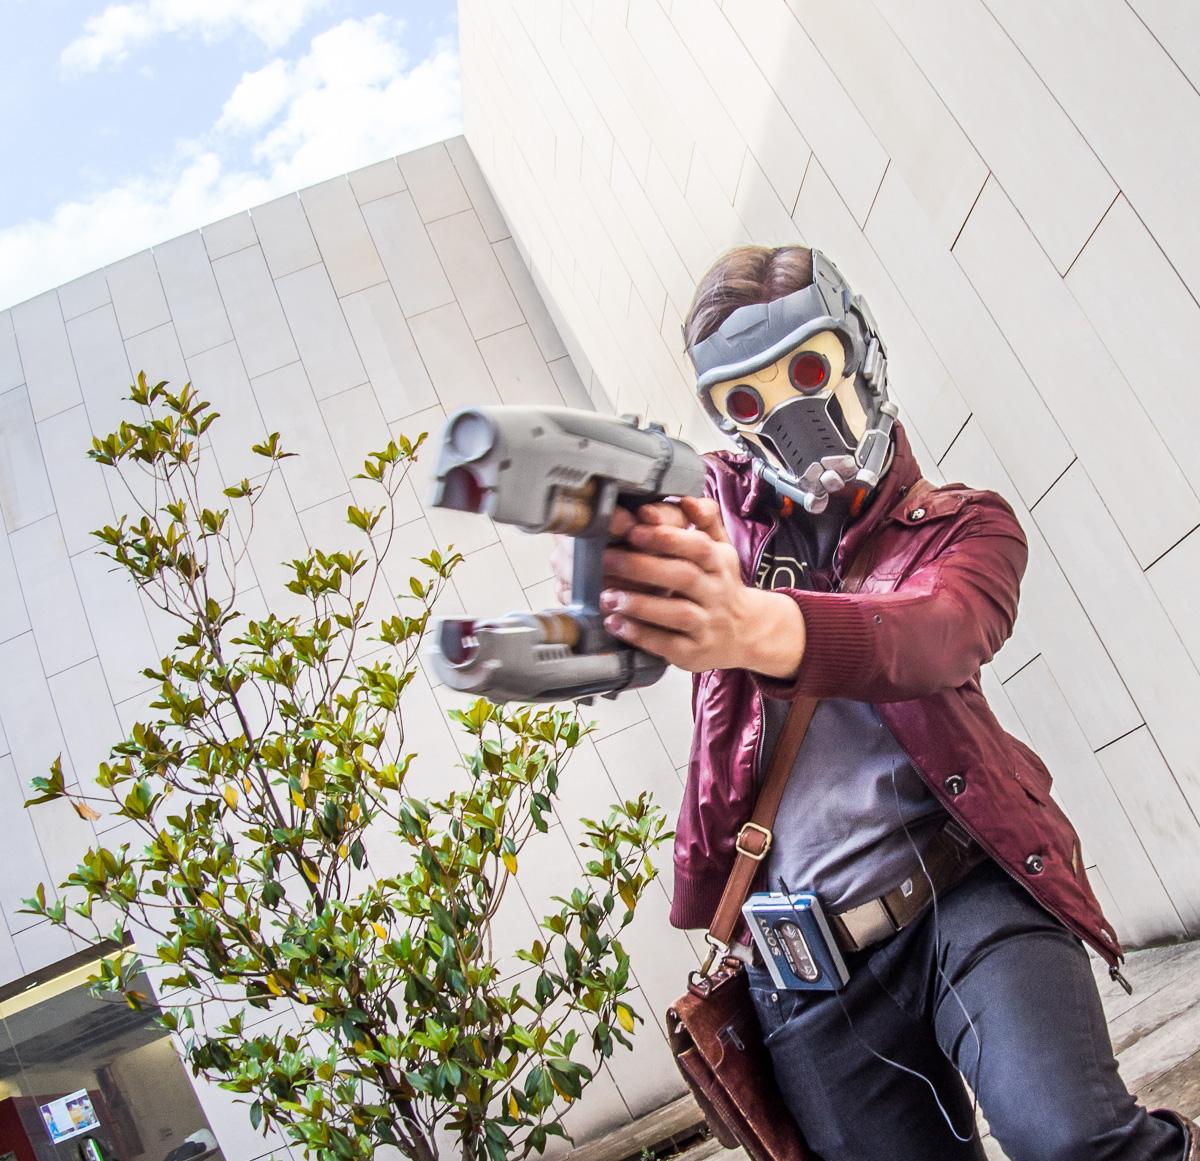 OTAKAI 2017 - Star Lord